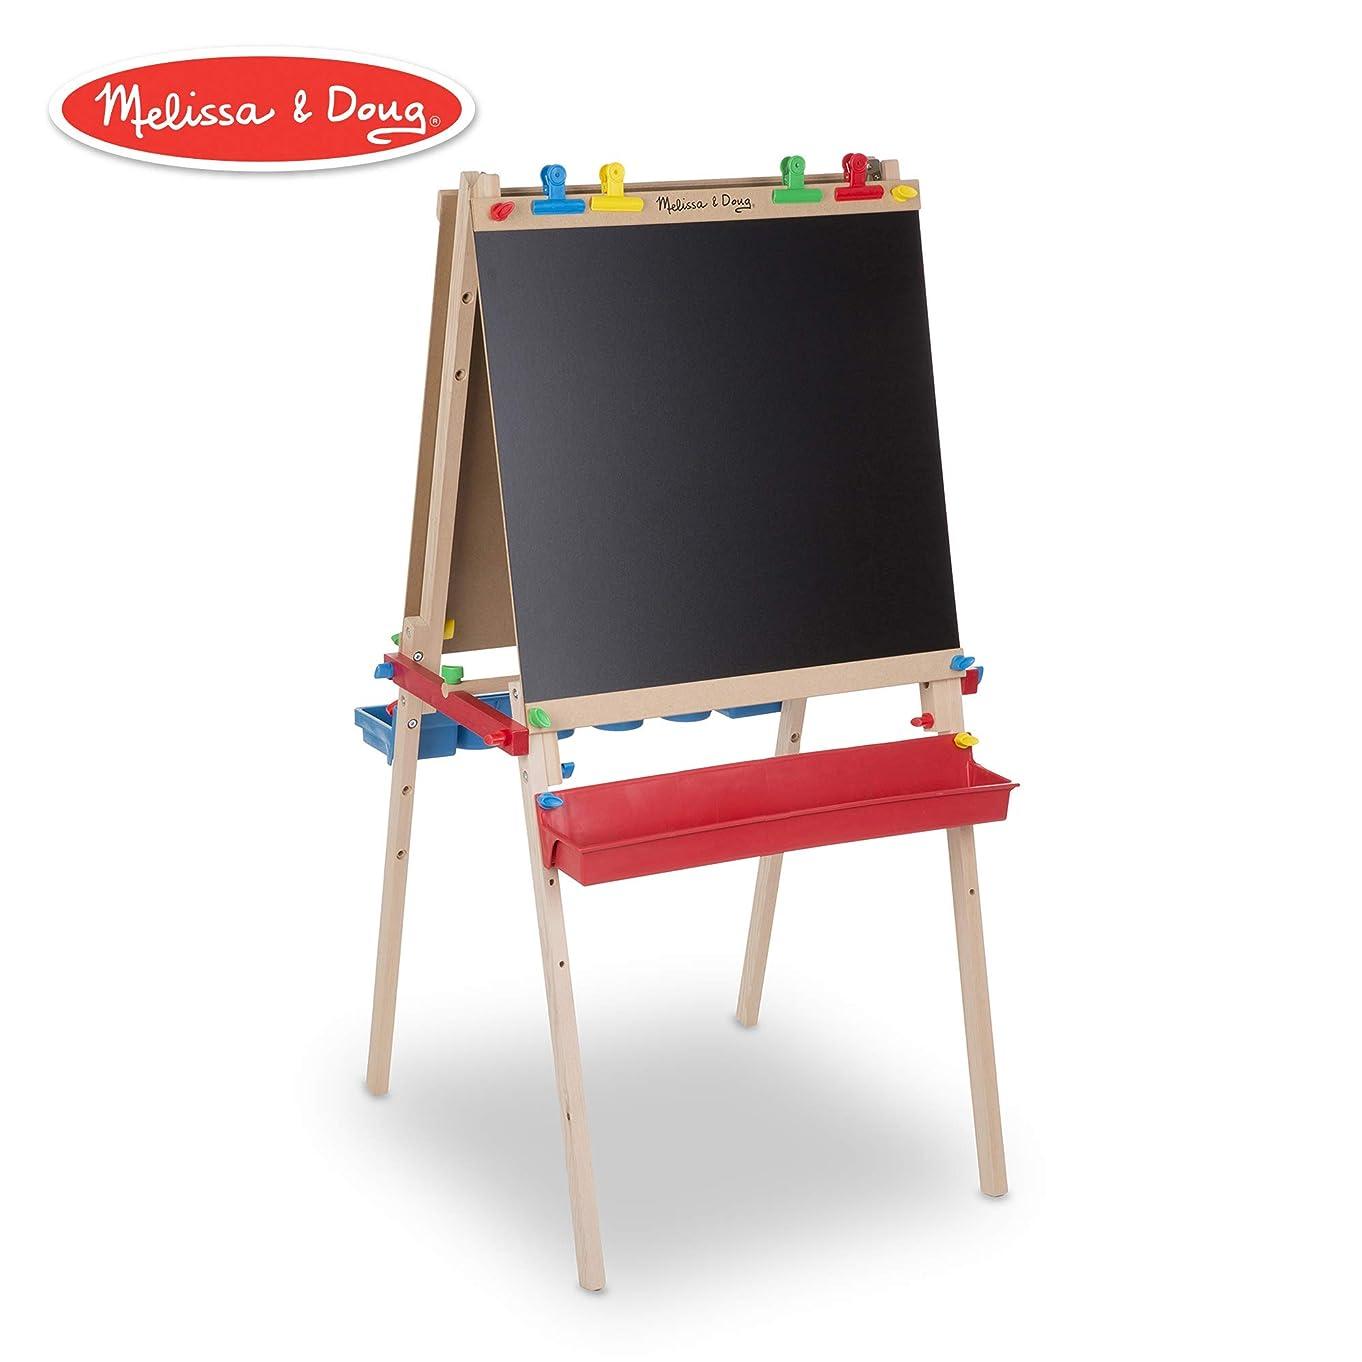 Melissa & Doug Deluxe Wooden Standing Art Easel, Arts & Crafts, Multiple-Use Easel, Chalkboard, Dry-Erase Board, Paper-Roll Holder, 47″ H × 27″ W × 26″ L Assembled